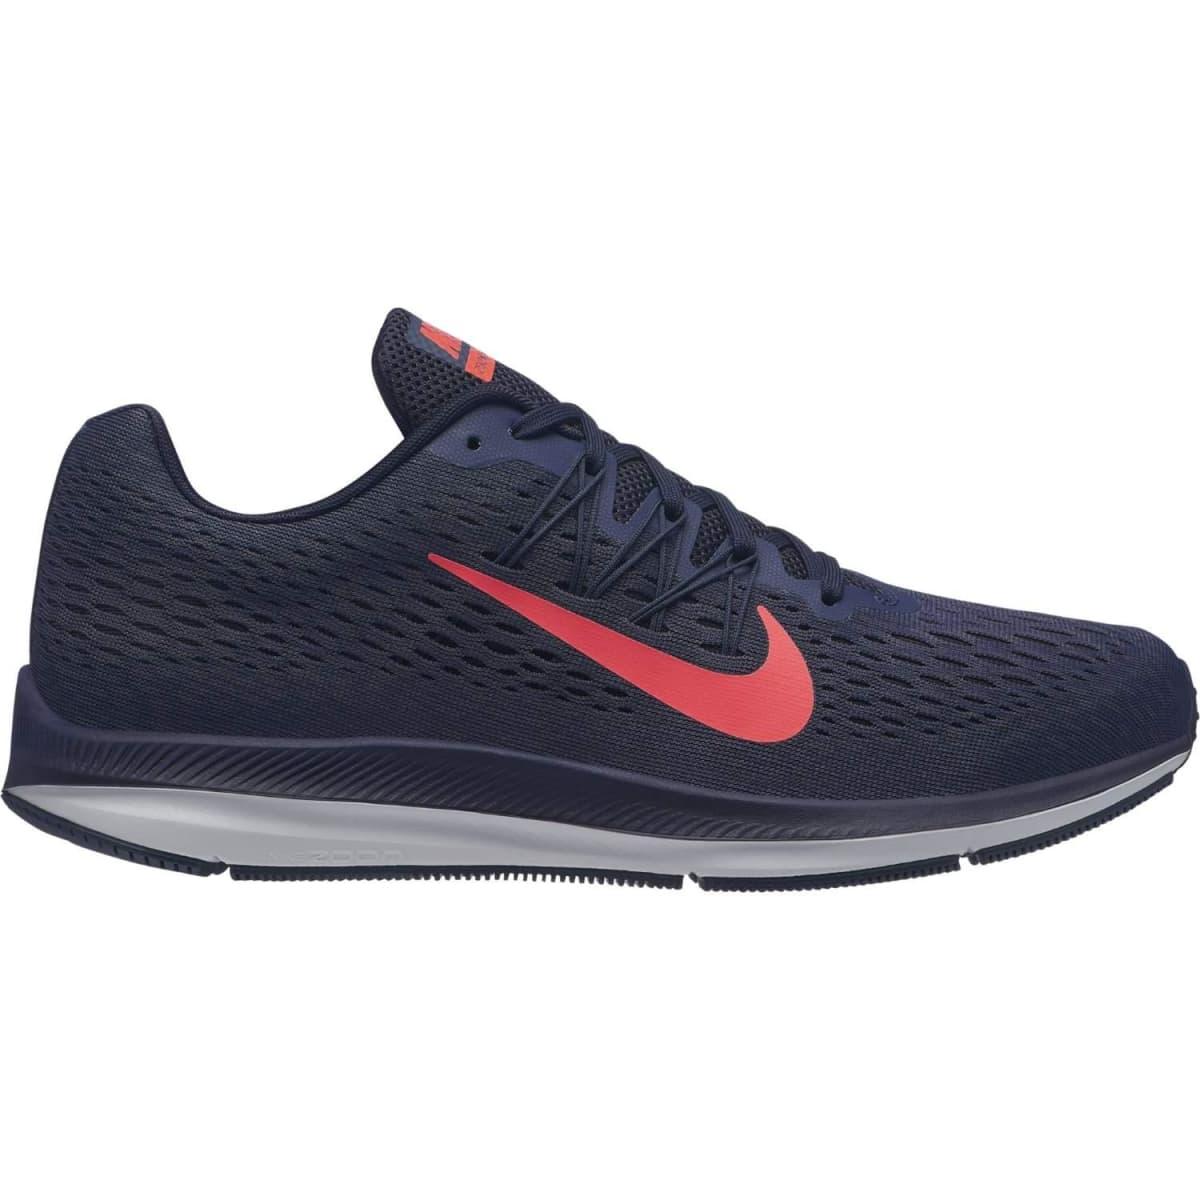 4121c0909bf8b Nike Men s Zoom Winflo 5 Running Shoes